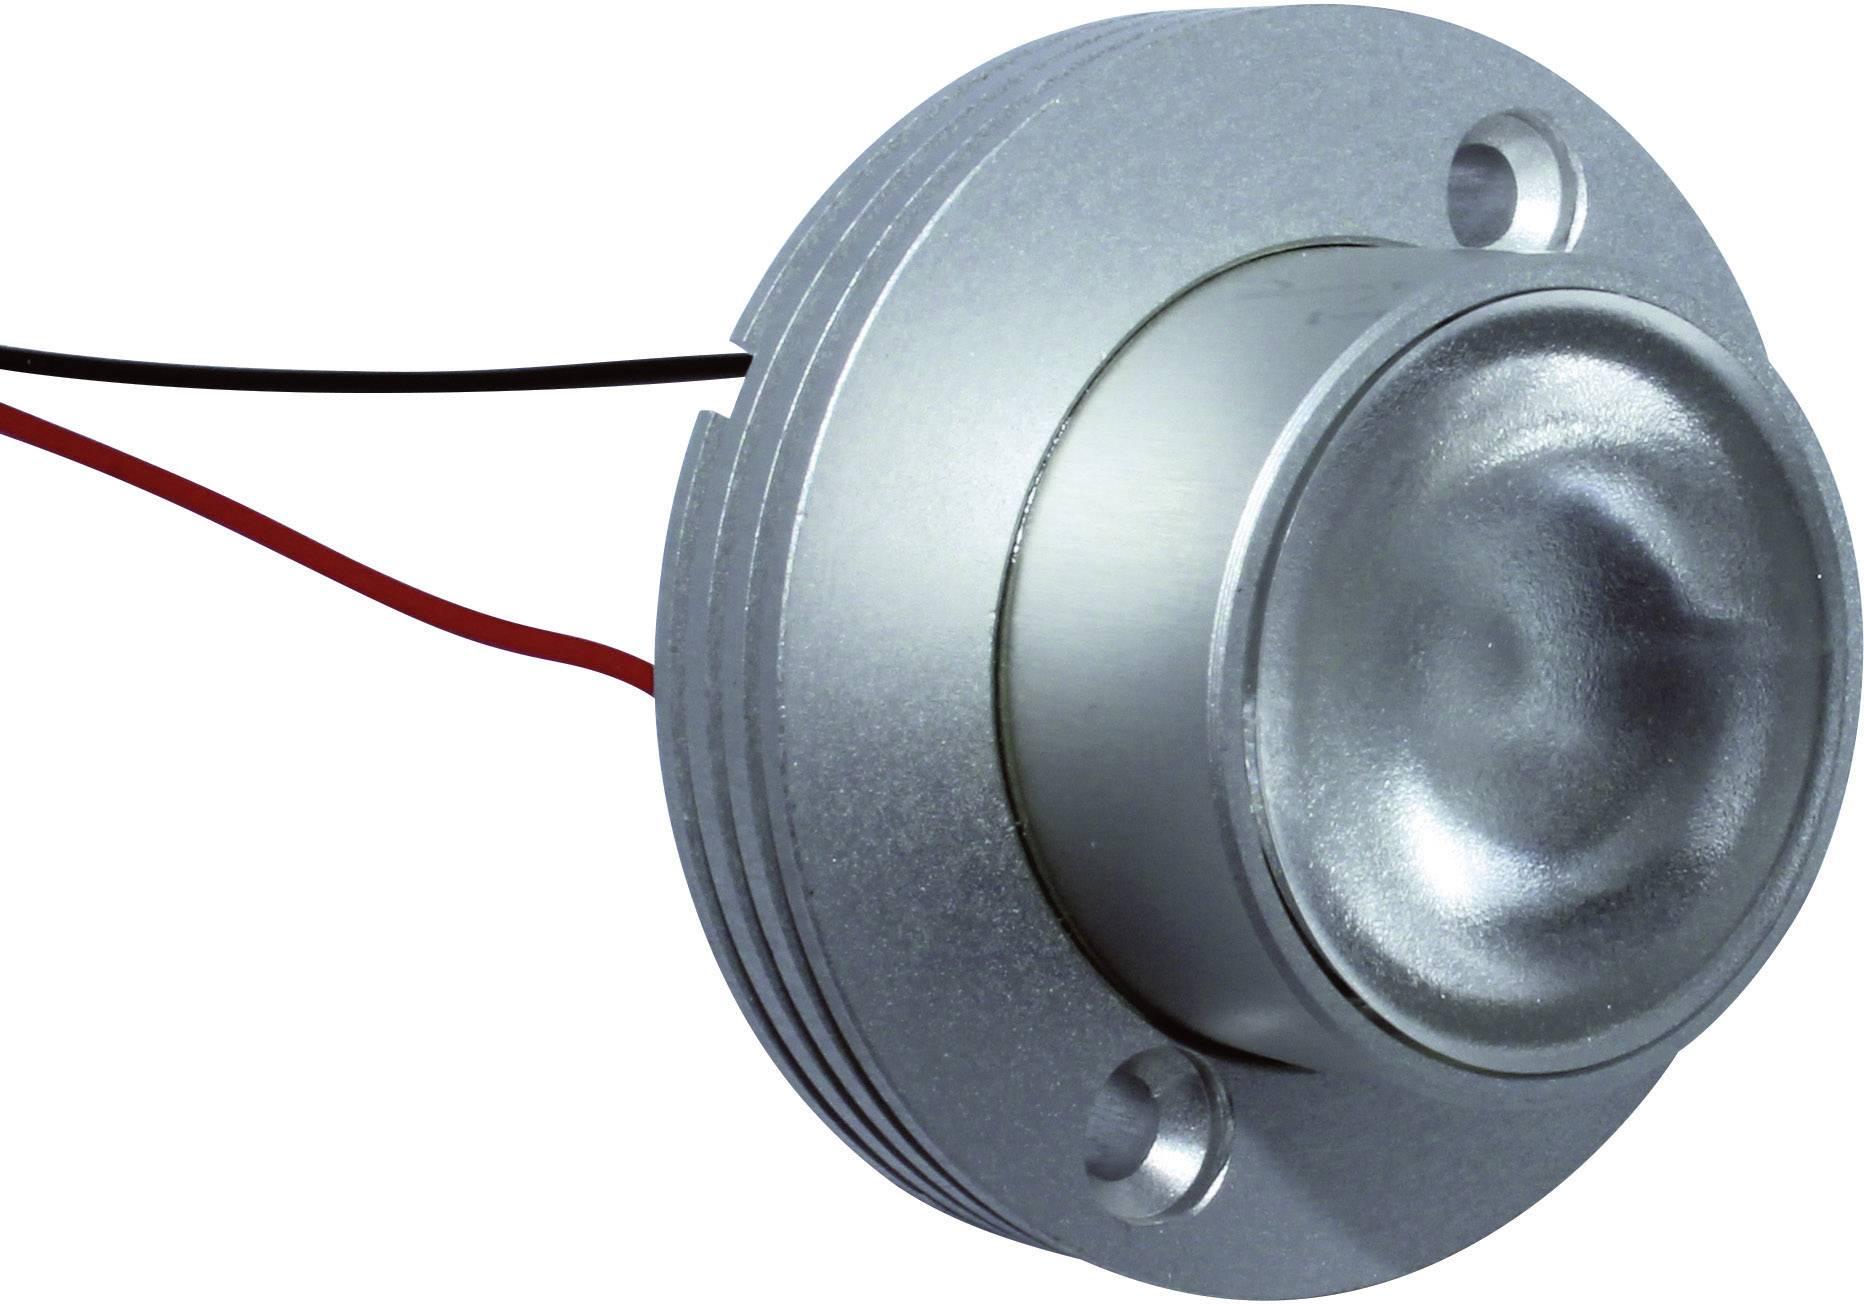 HighPower LED-spot Signal Construct QAUR1561L030, 45 °, 140 lm, 1 W, 3.3 V, biela